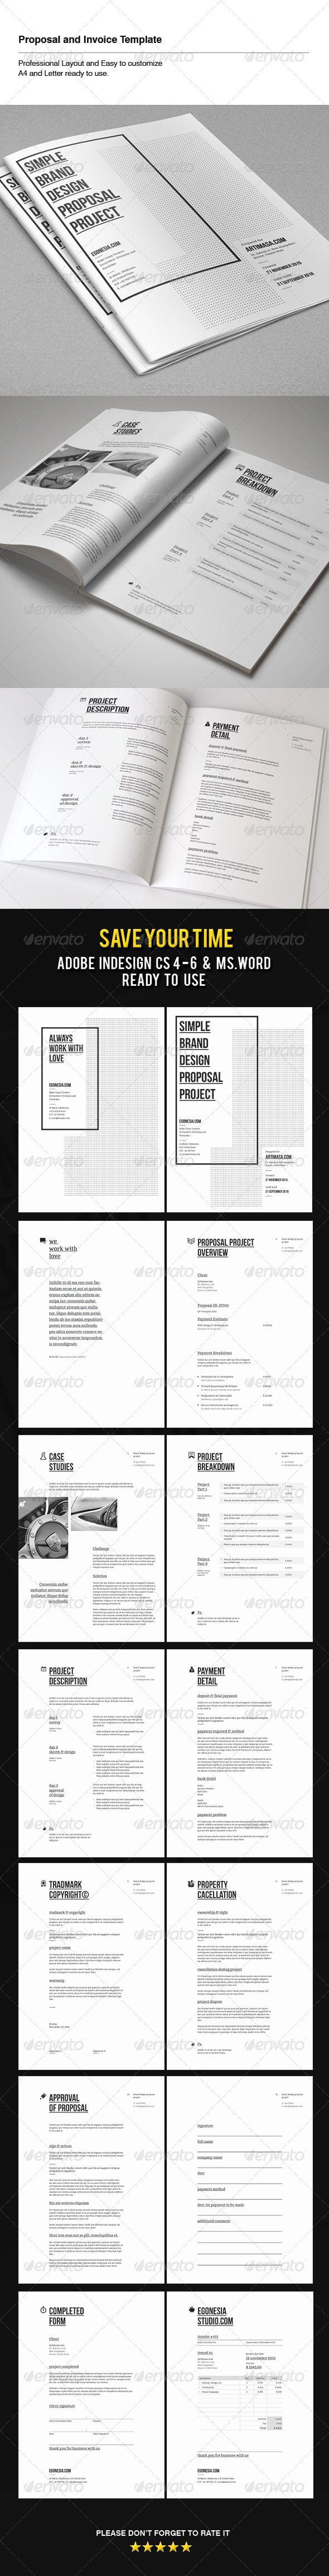 Proposal & Invoice Template | Adobe, Textos y Adobe indesign